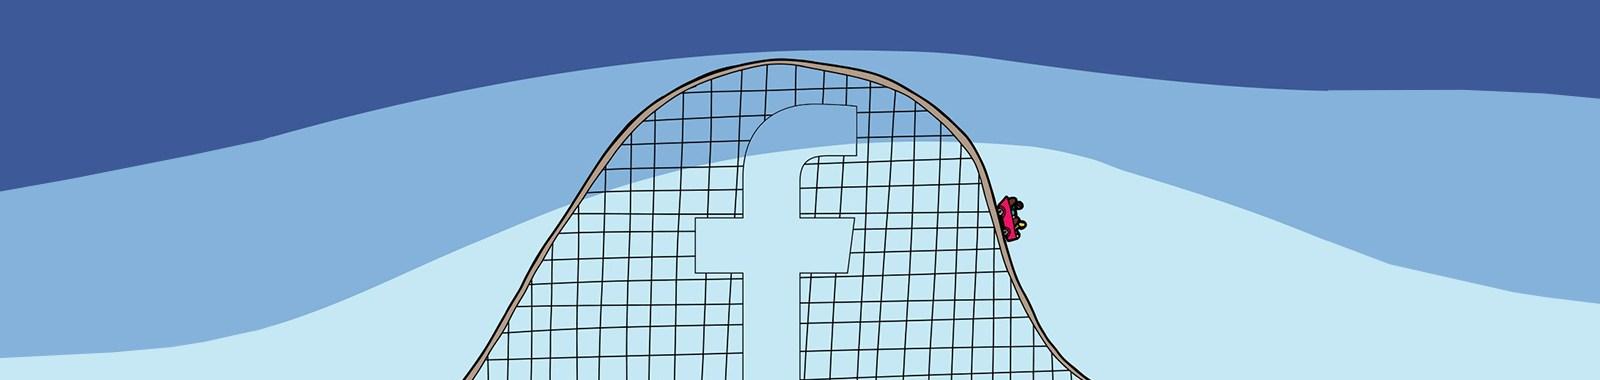 fb roller coaster